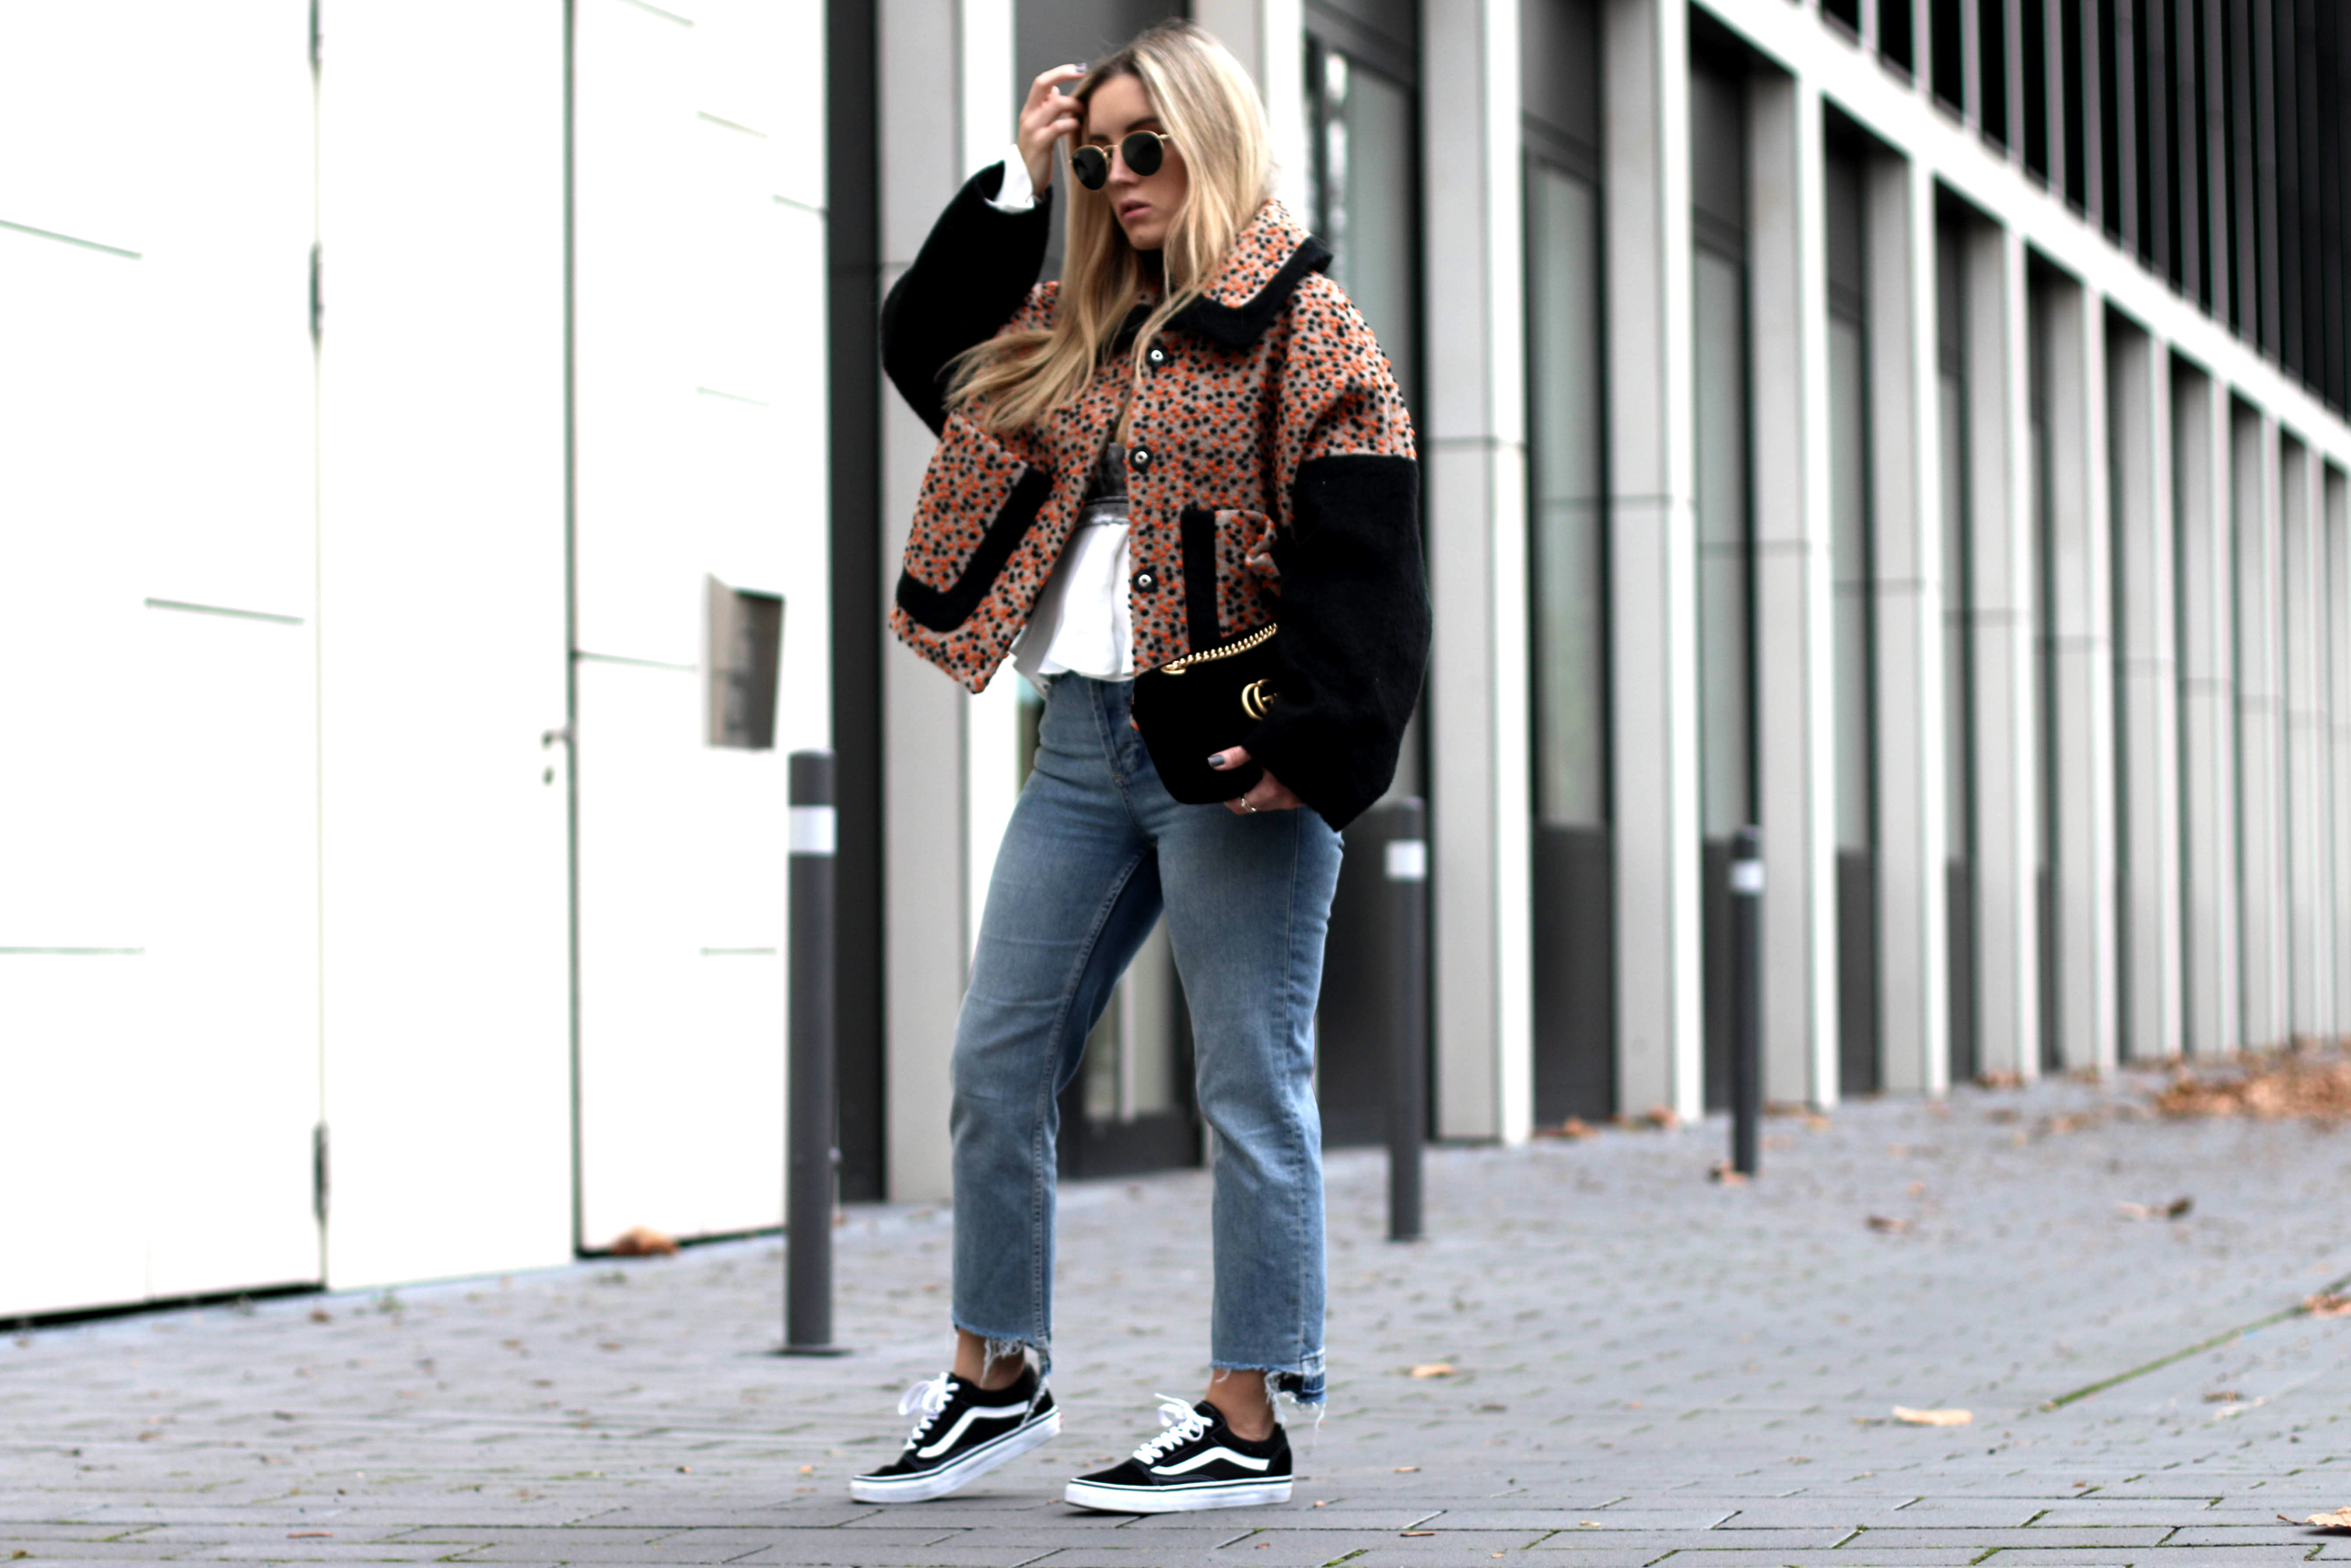 Oversized Jacket x Vans Old Skool. u2022 Fashiontwinstinct   By Su u0026 Chris